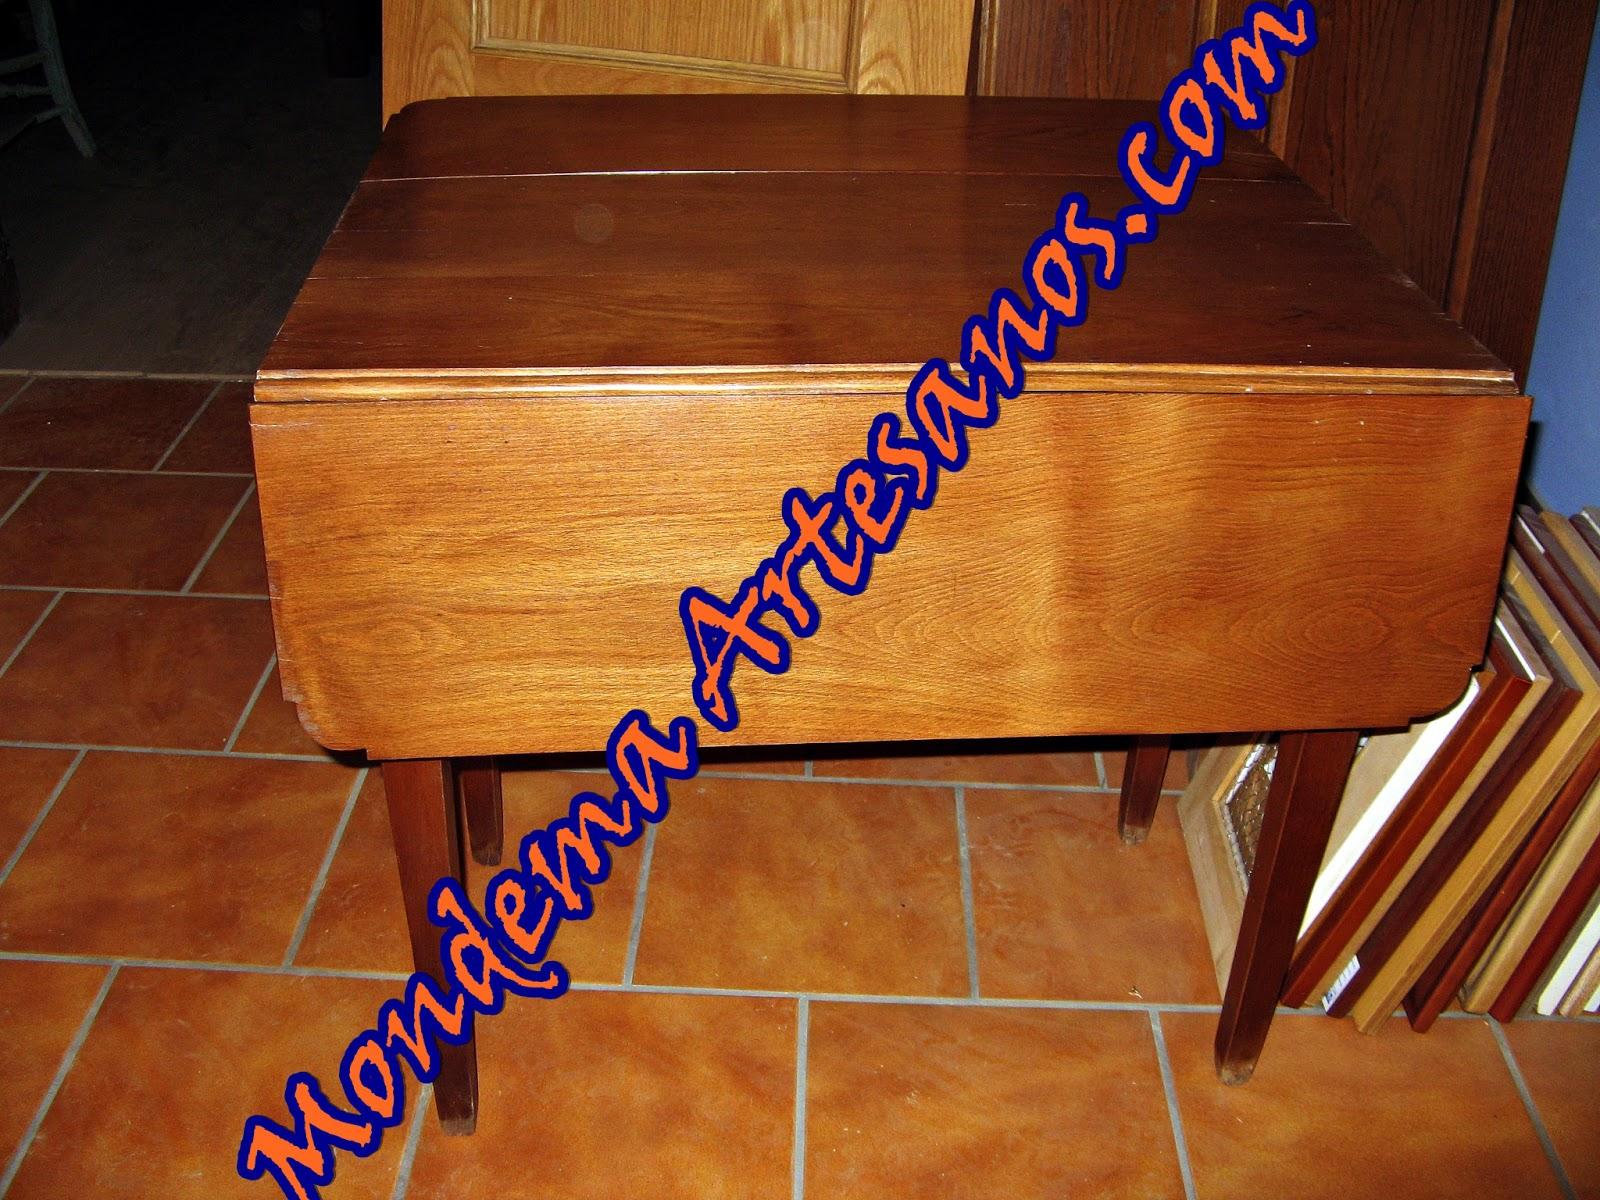 Restauracion de mesa con alas abatibles artesanos - Mesas con alas abatibles ...